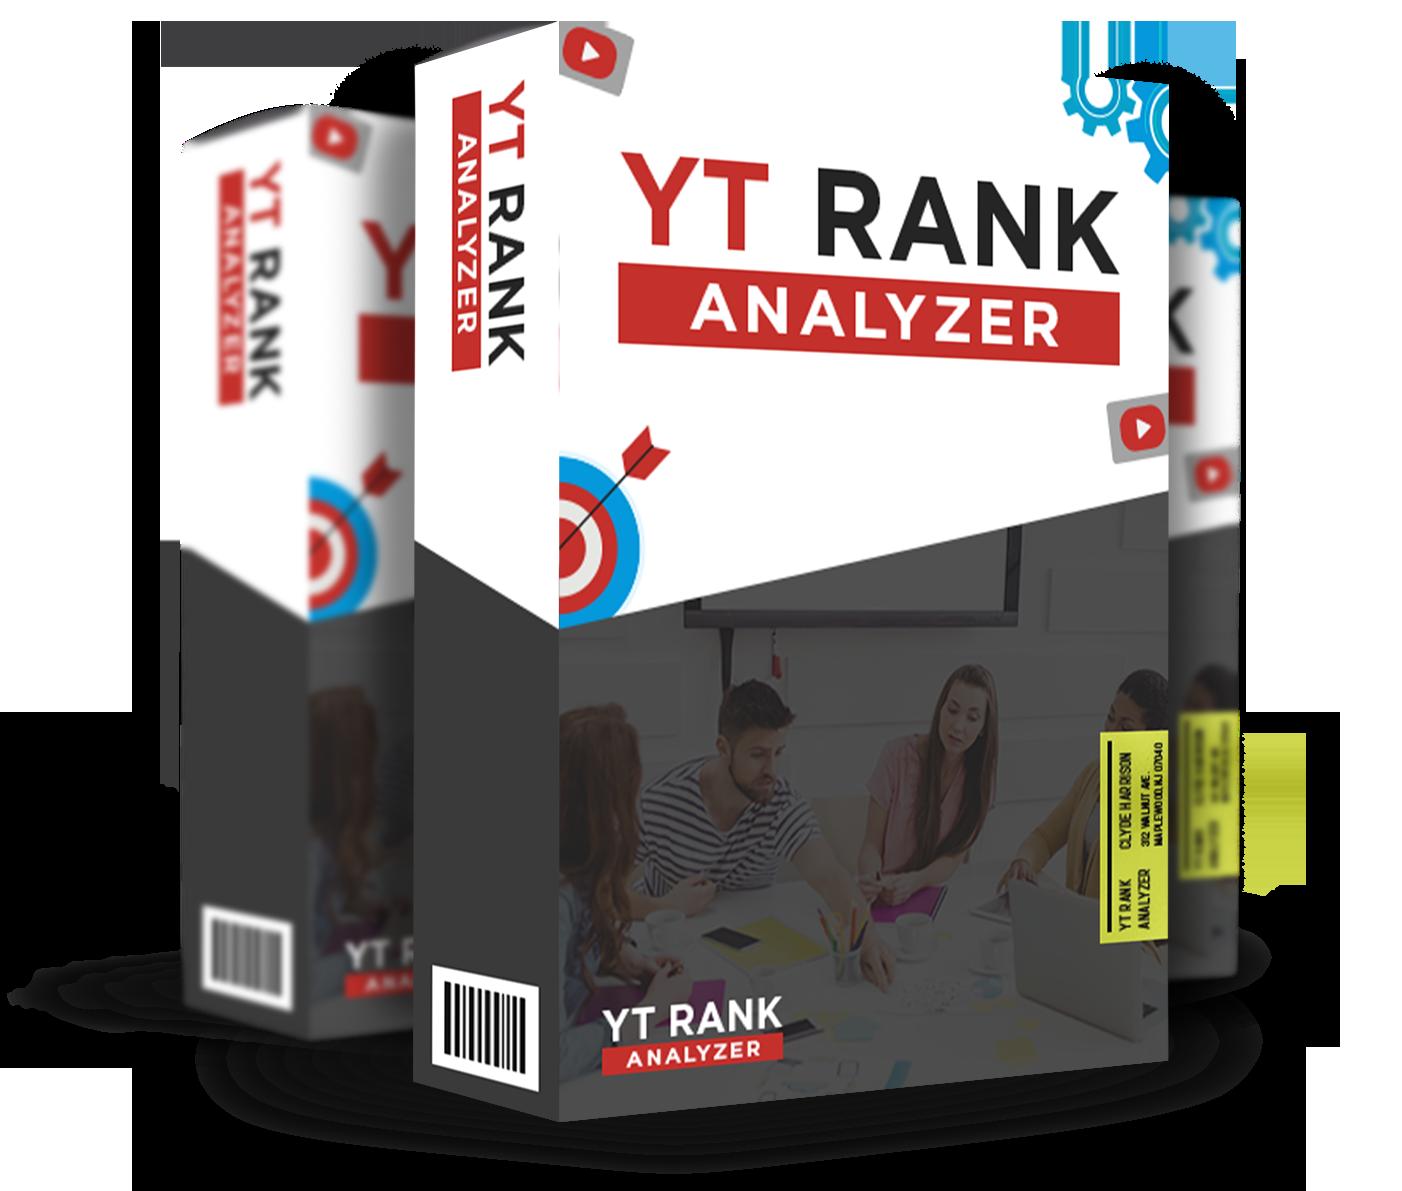 YT Rank Analyzer cover mockup